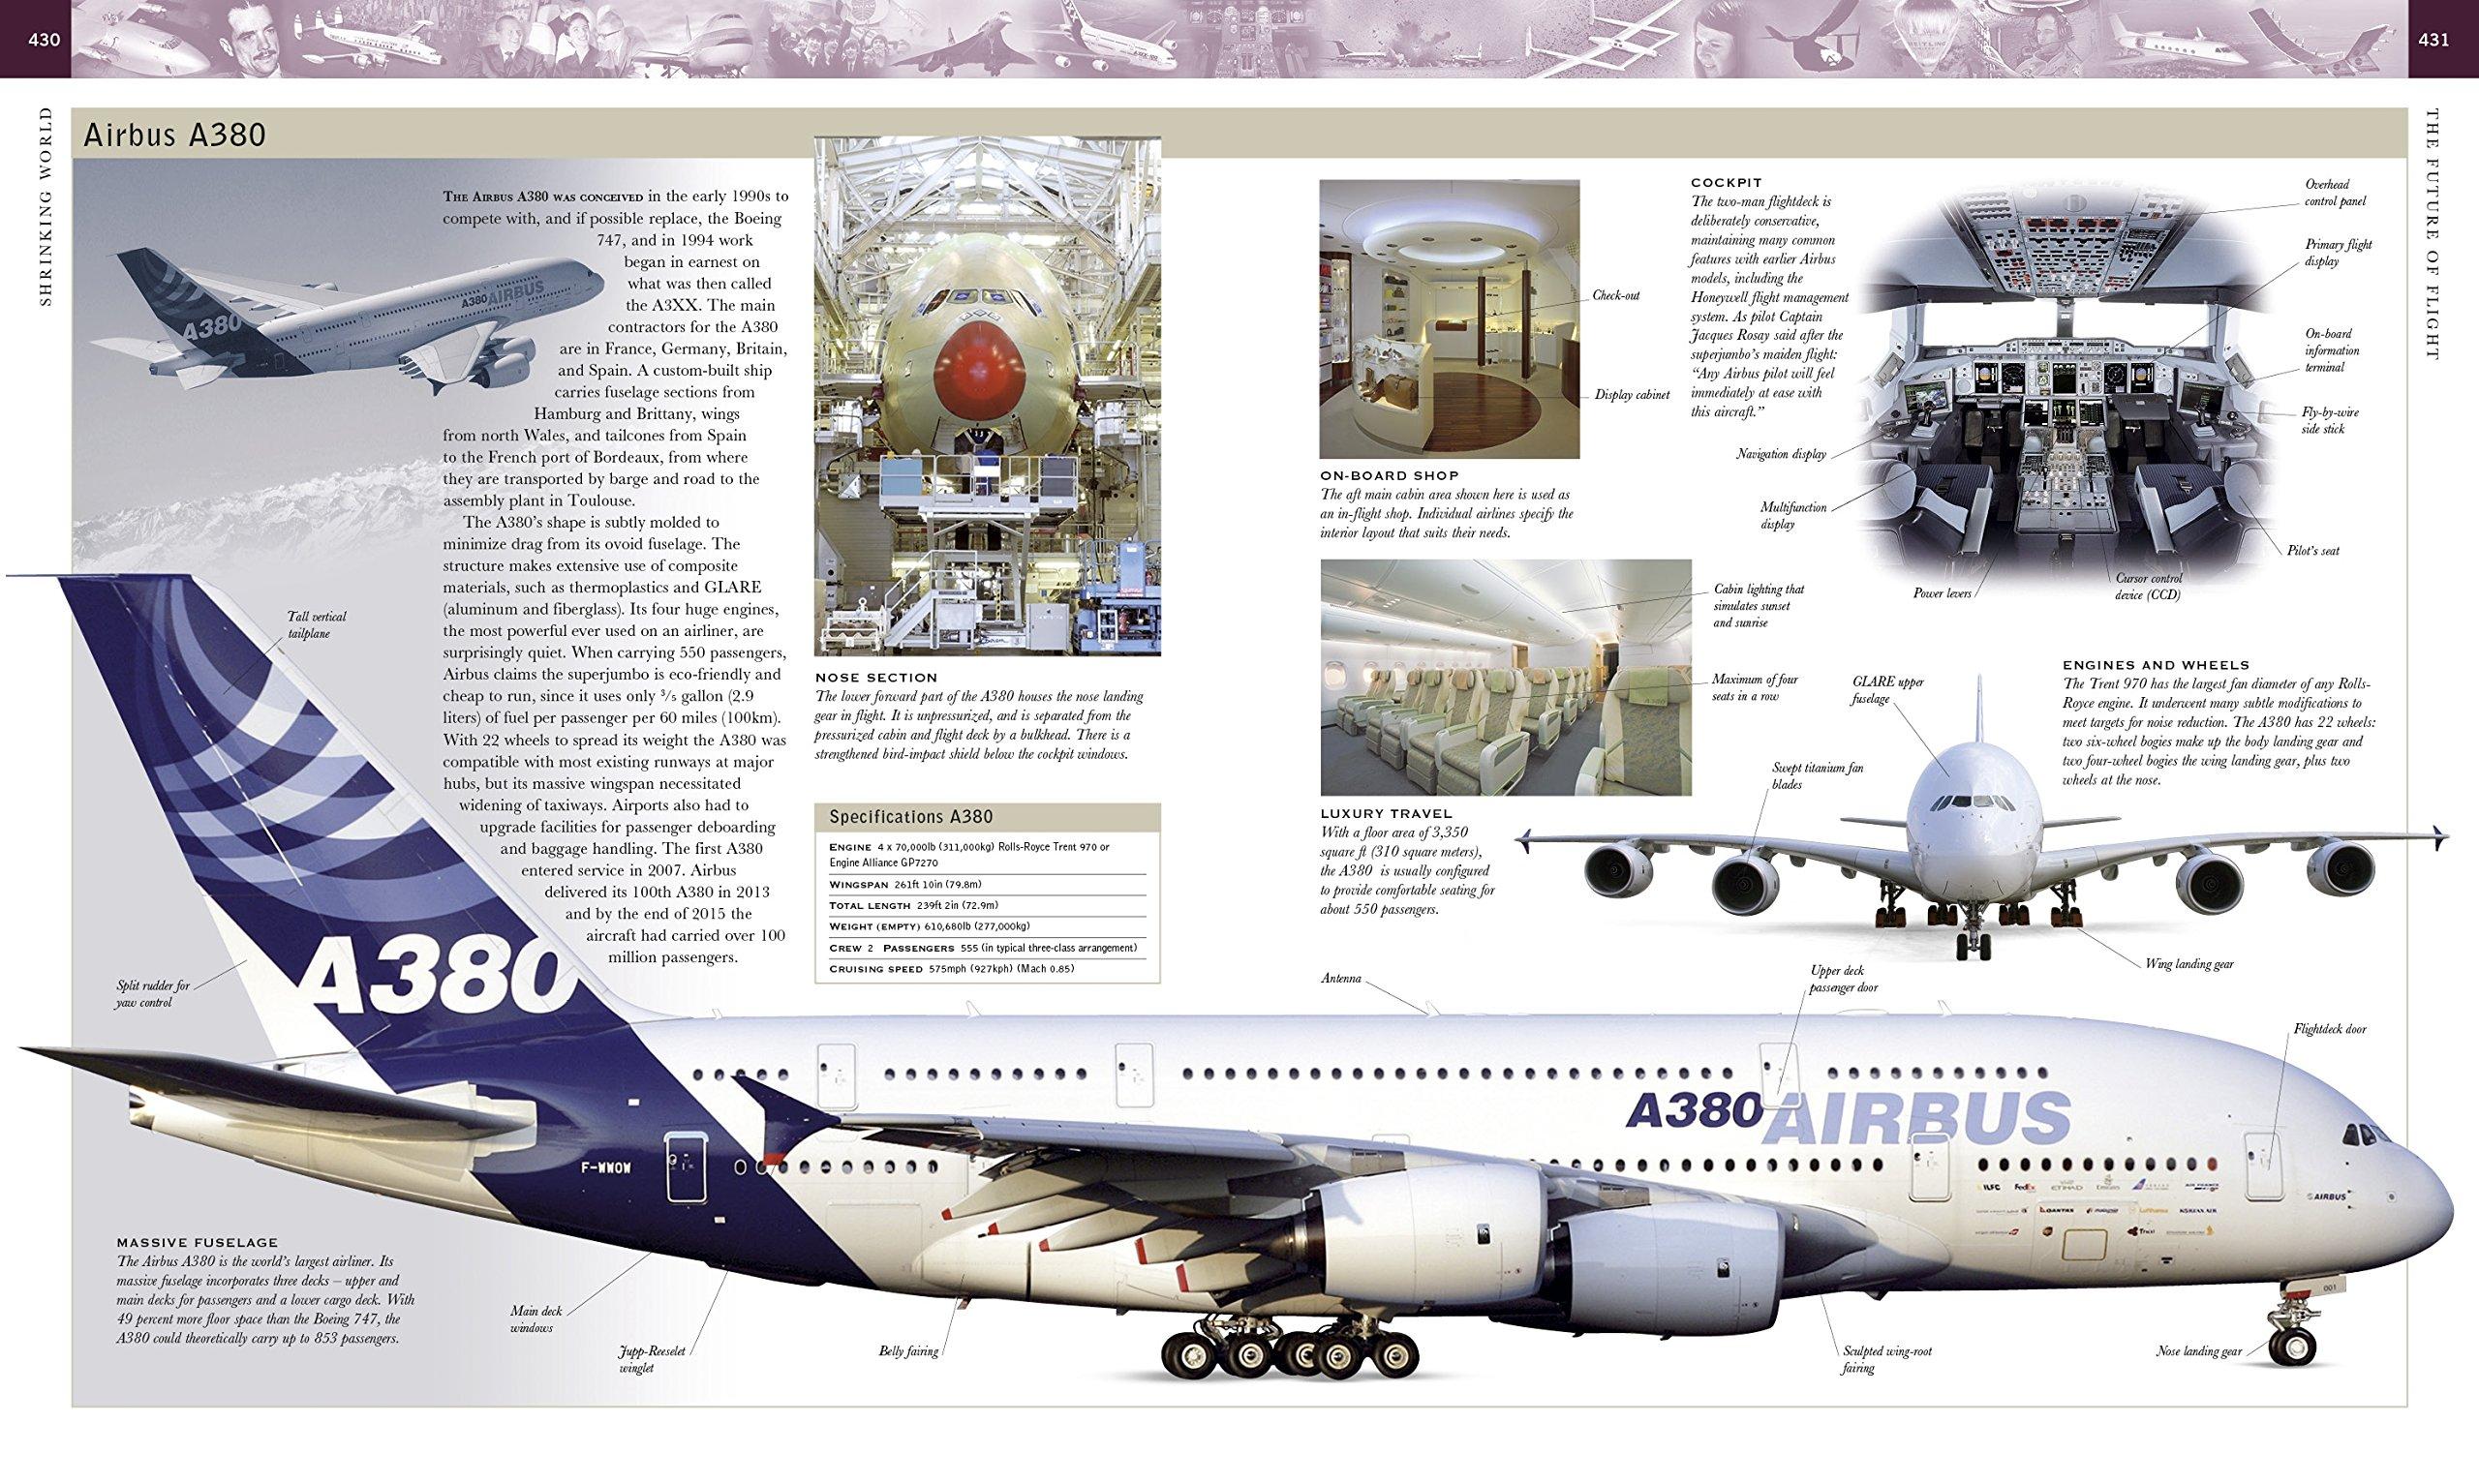 Childbirth on the plane: a stunning eyewitness story